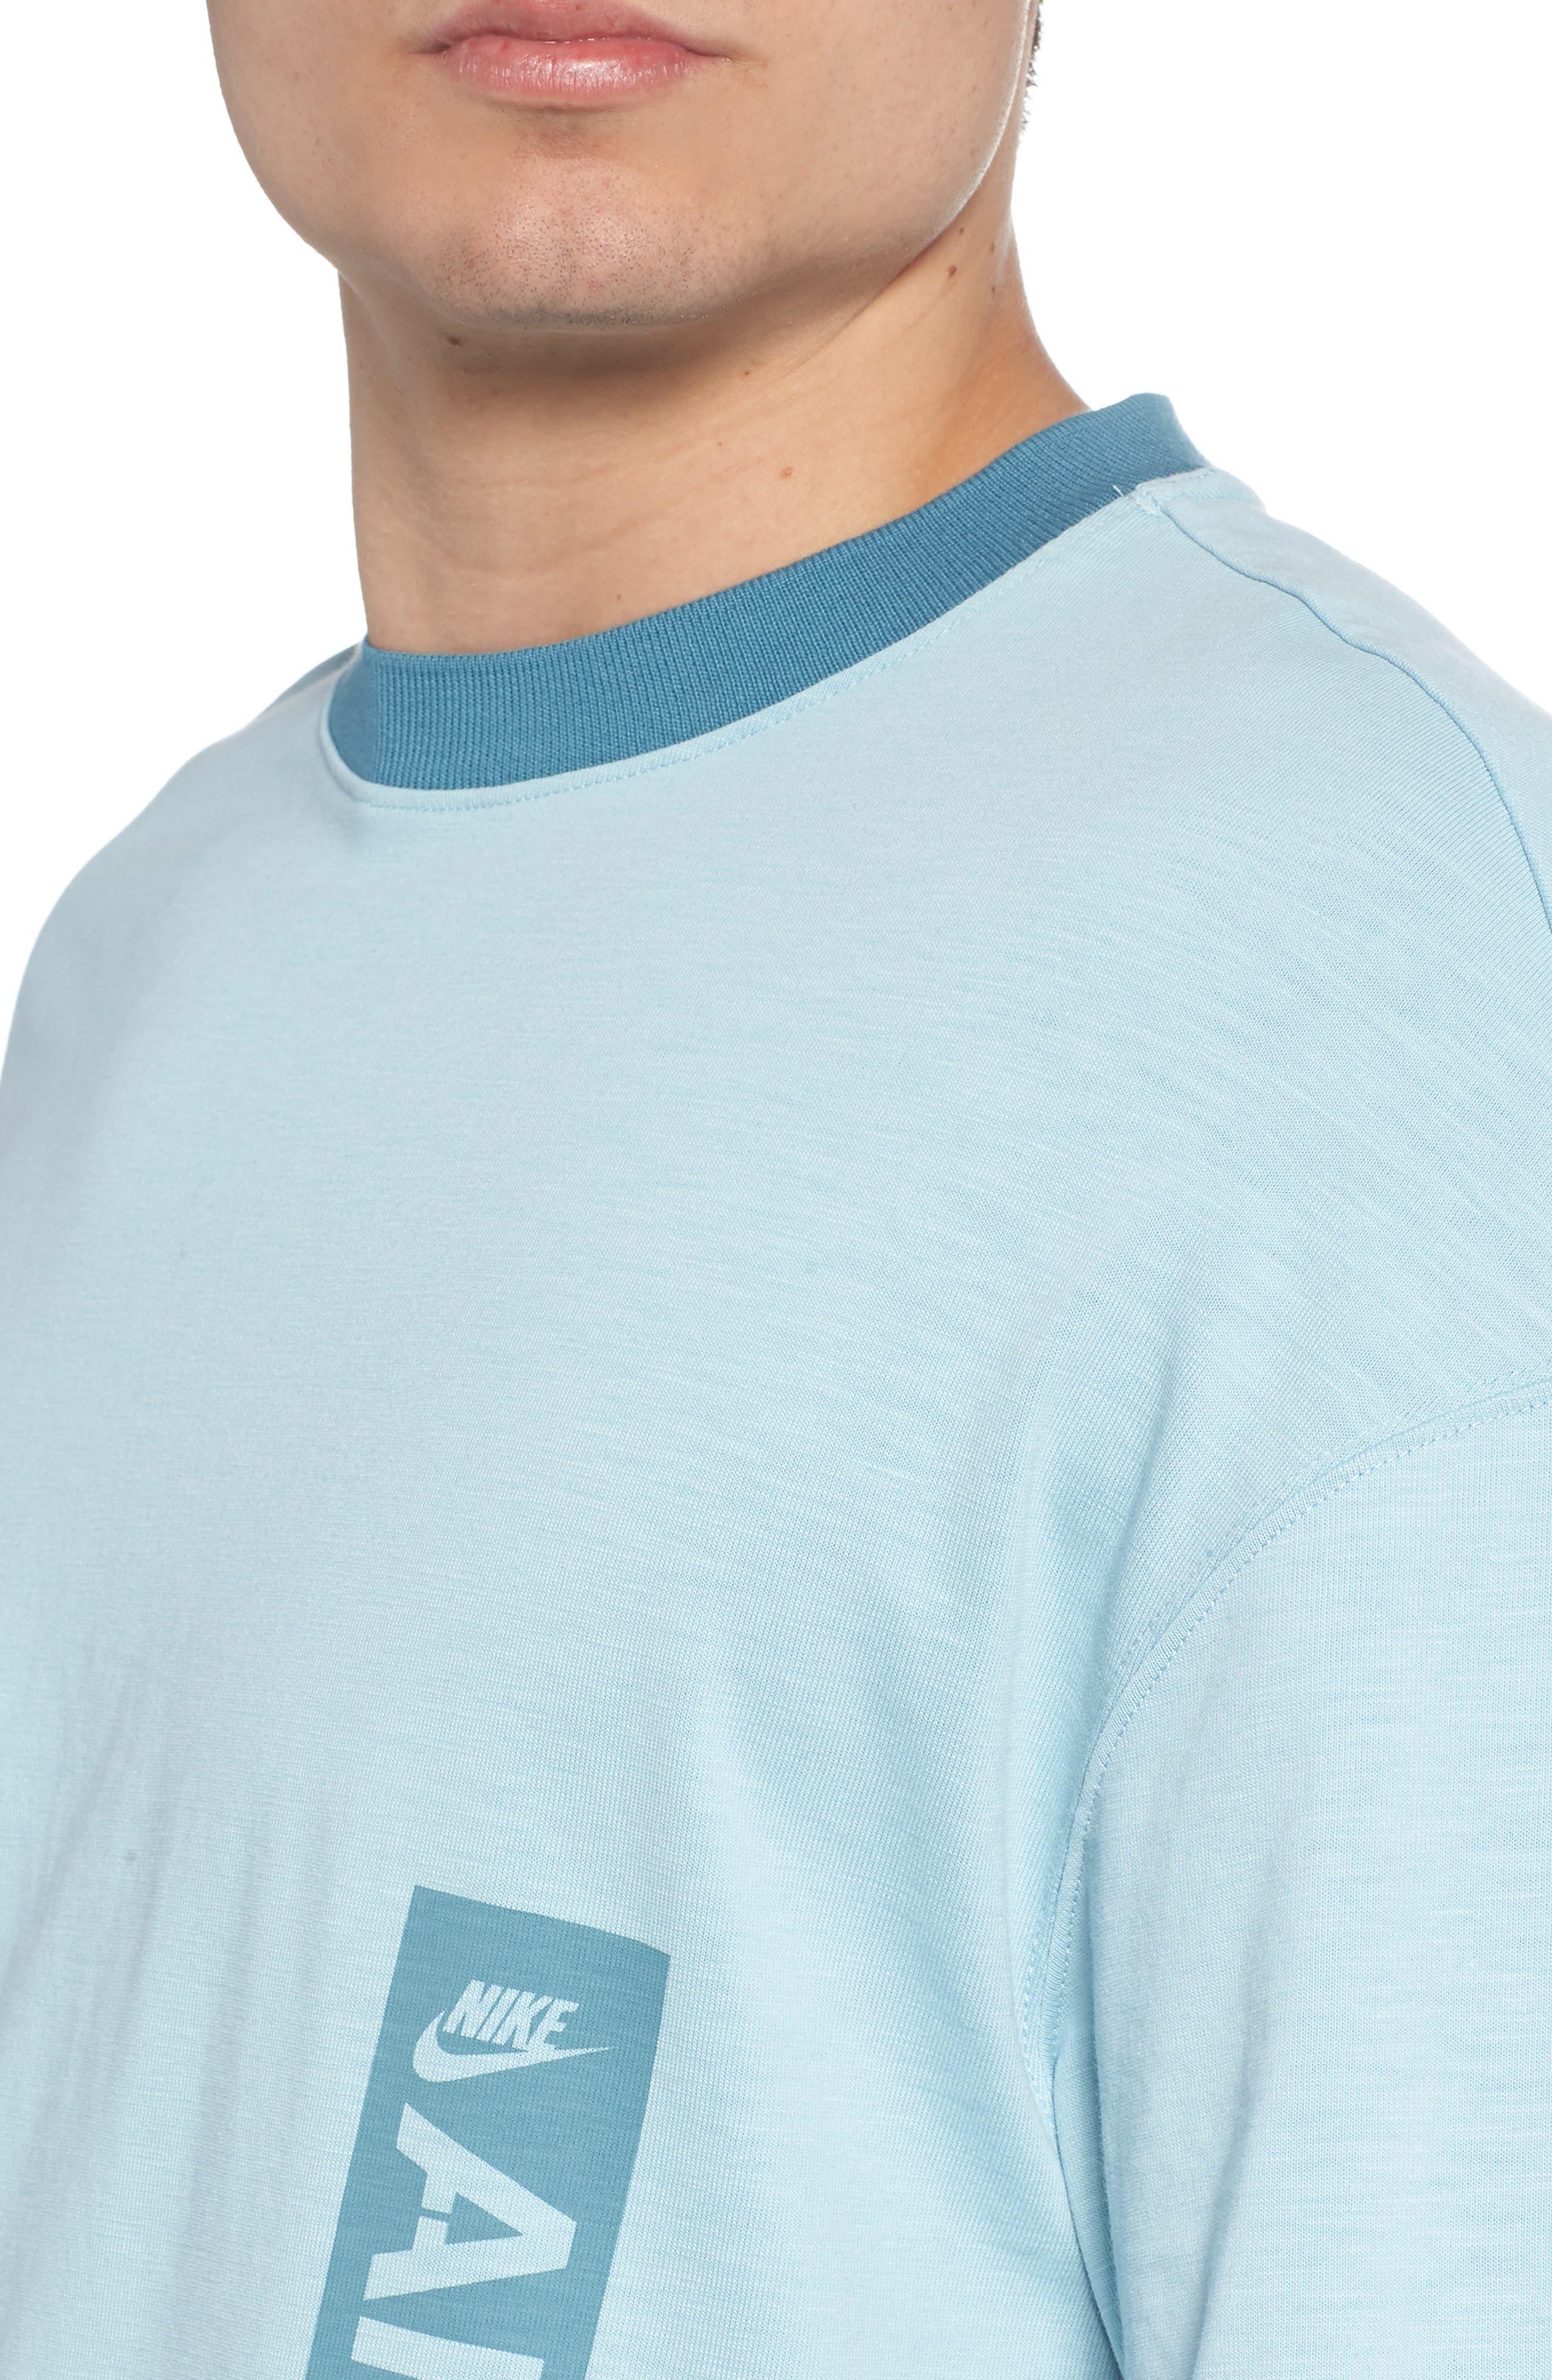 Sportswear AF1 Graphic T-Shirt,                             Alternate thumbnail 4, color,                             OCEAN BLISS/ NOISE AQUA